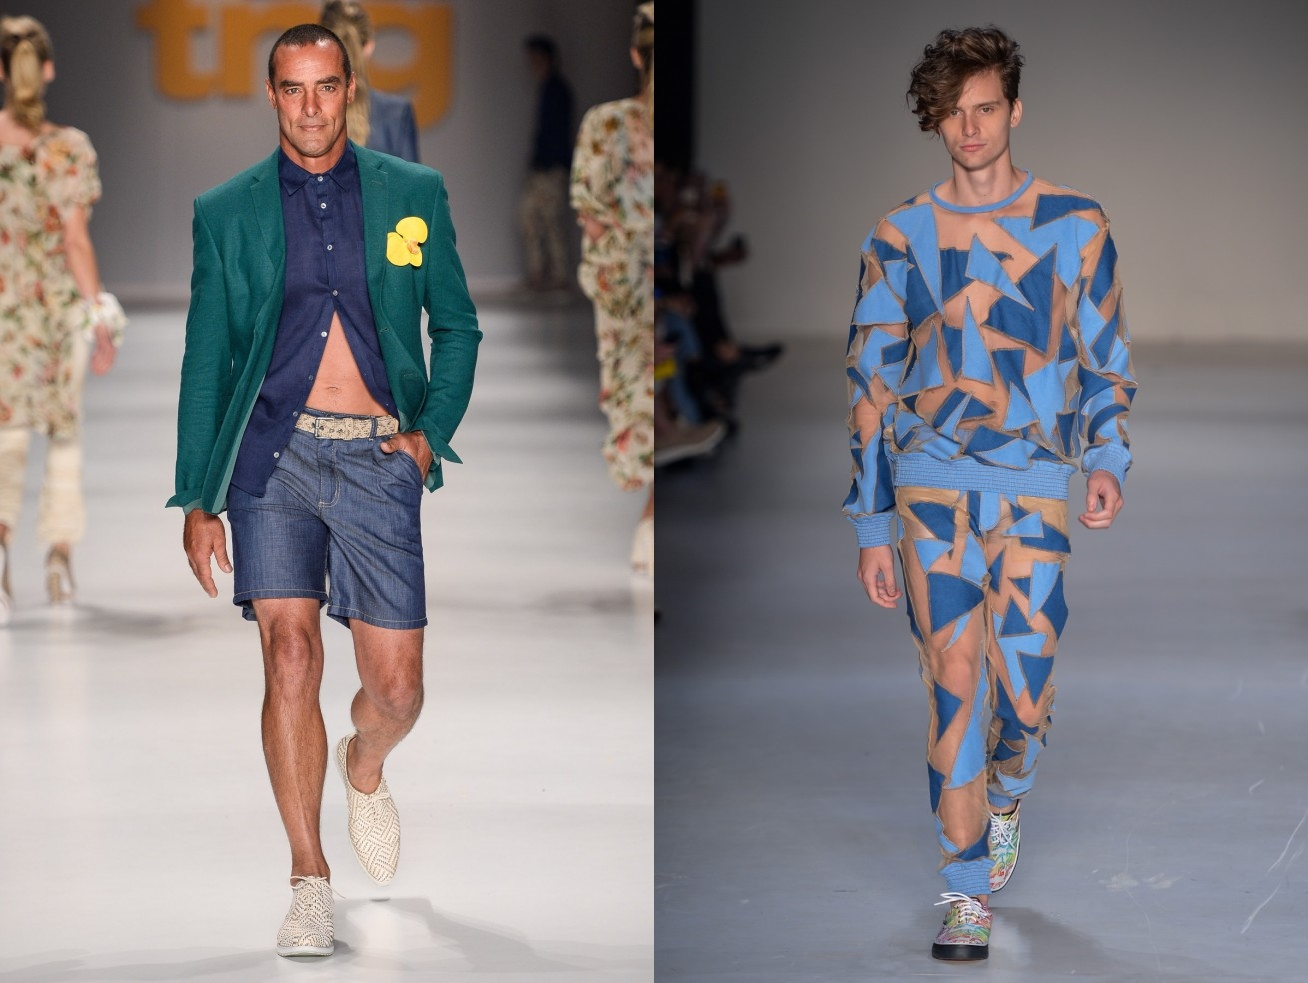 tendencia masculina, verão 2016, tendencia 2015, tendencia 2016, moda masculina, menswear, fashion blogger, blog de moda, alex cursino, moda sem censura, style, spfw, fashion week,